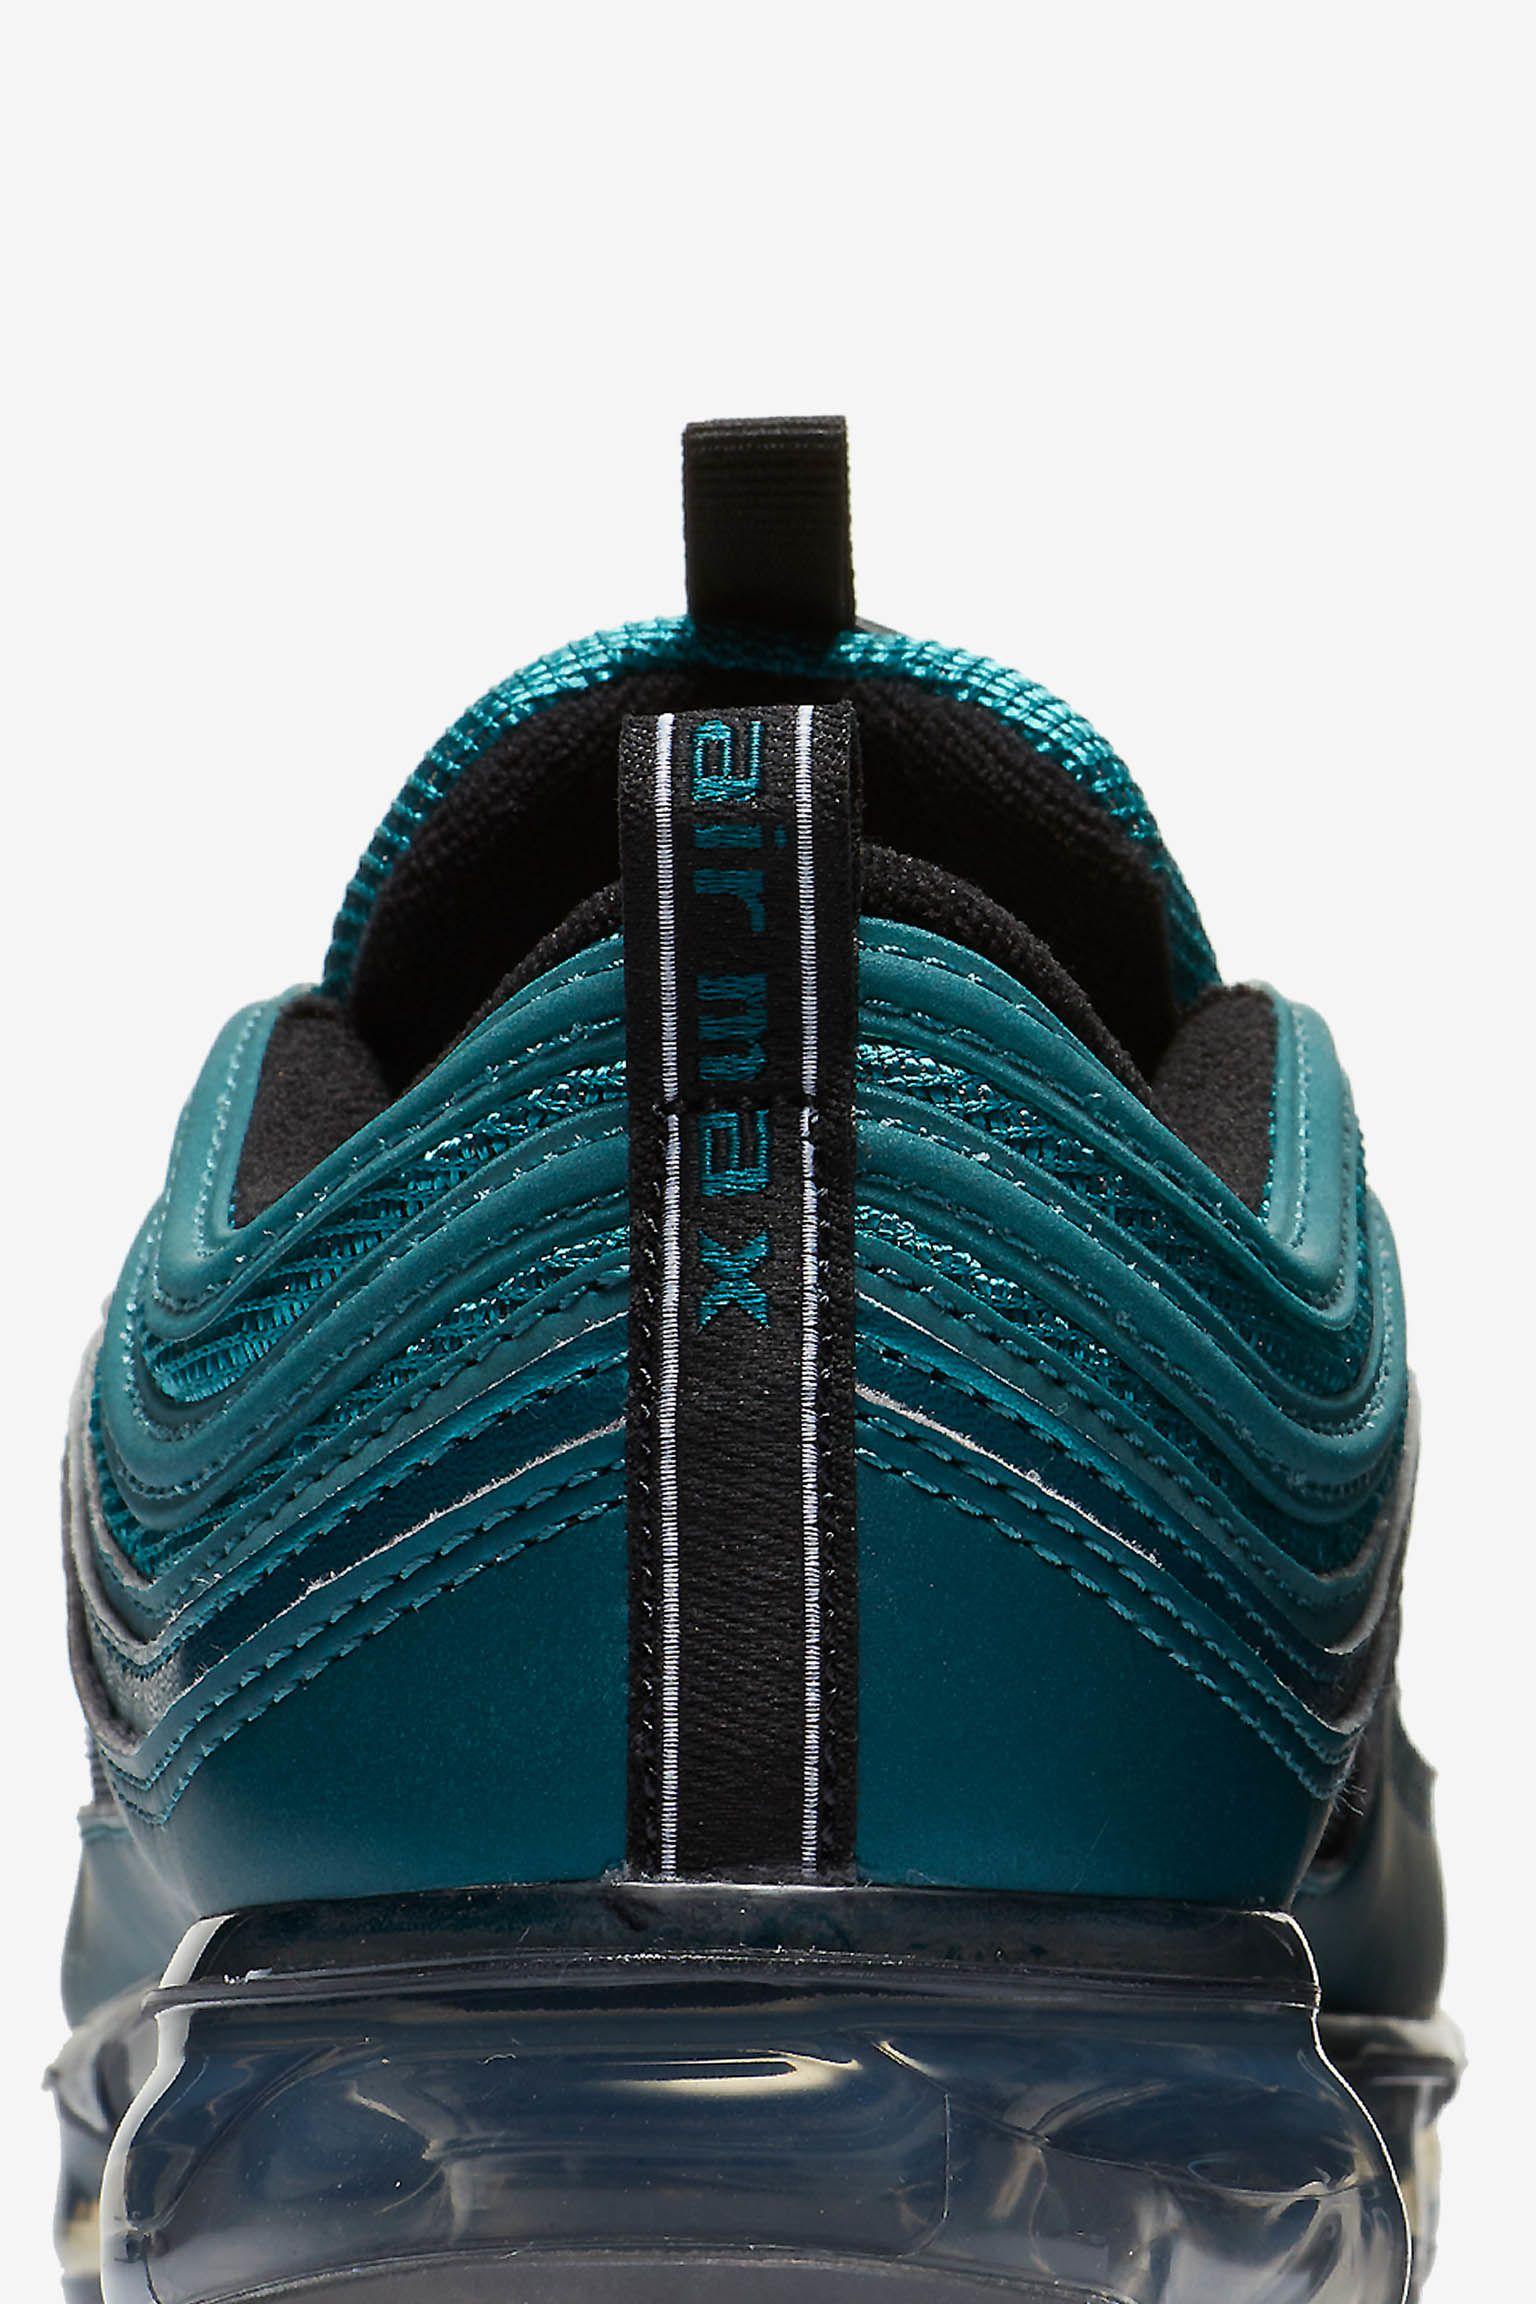 Nike Women's Air Vapormax 97 'Metallic Dark Sea & Black' Release Date